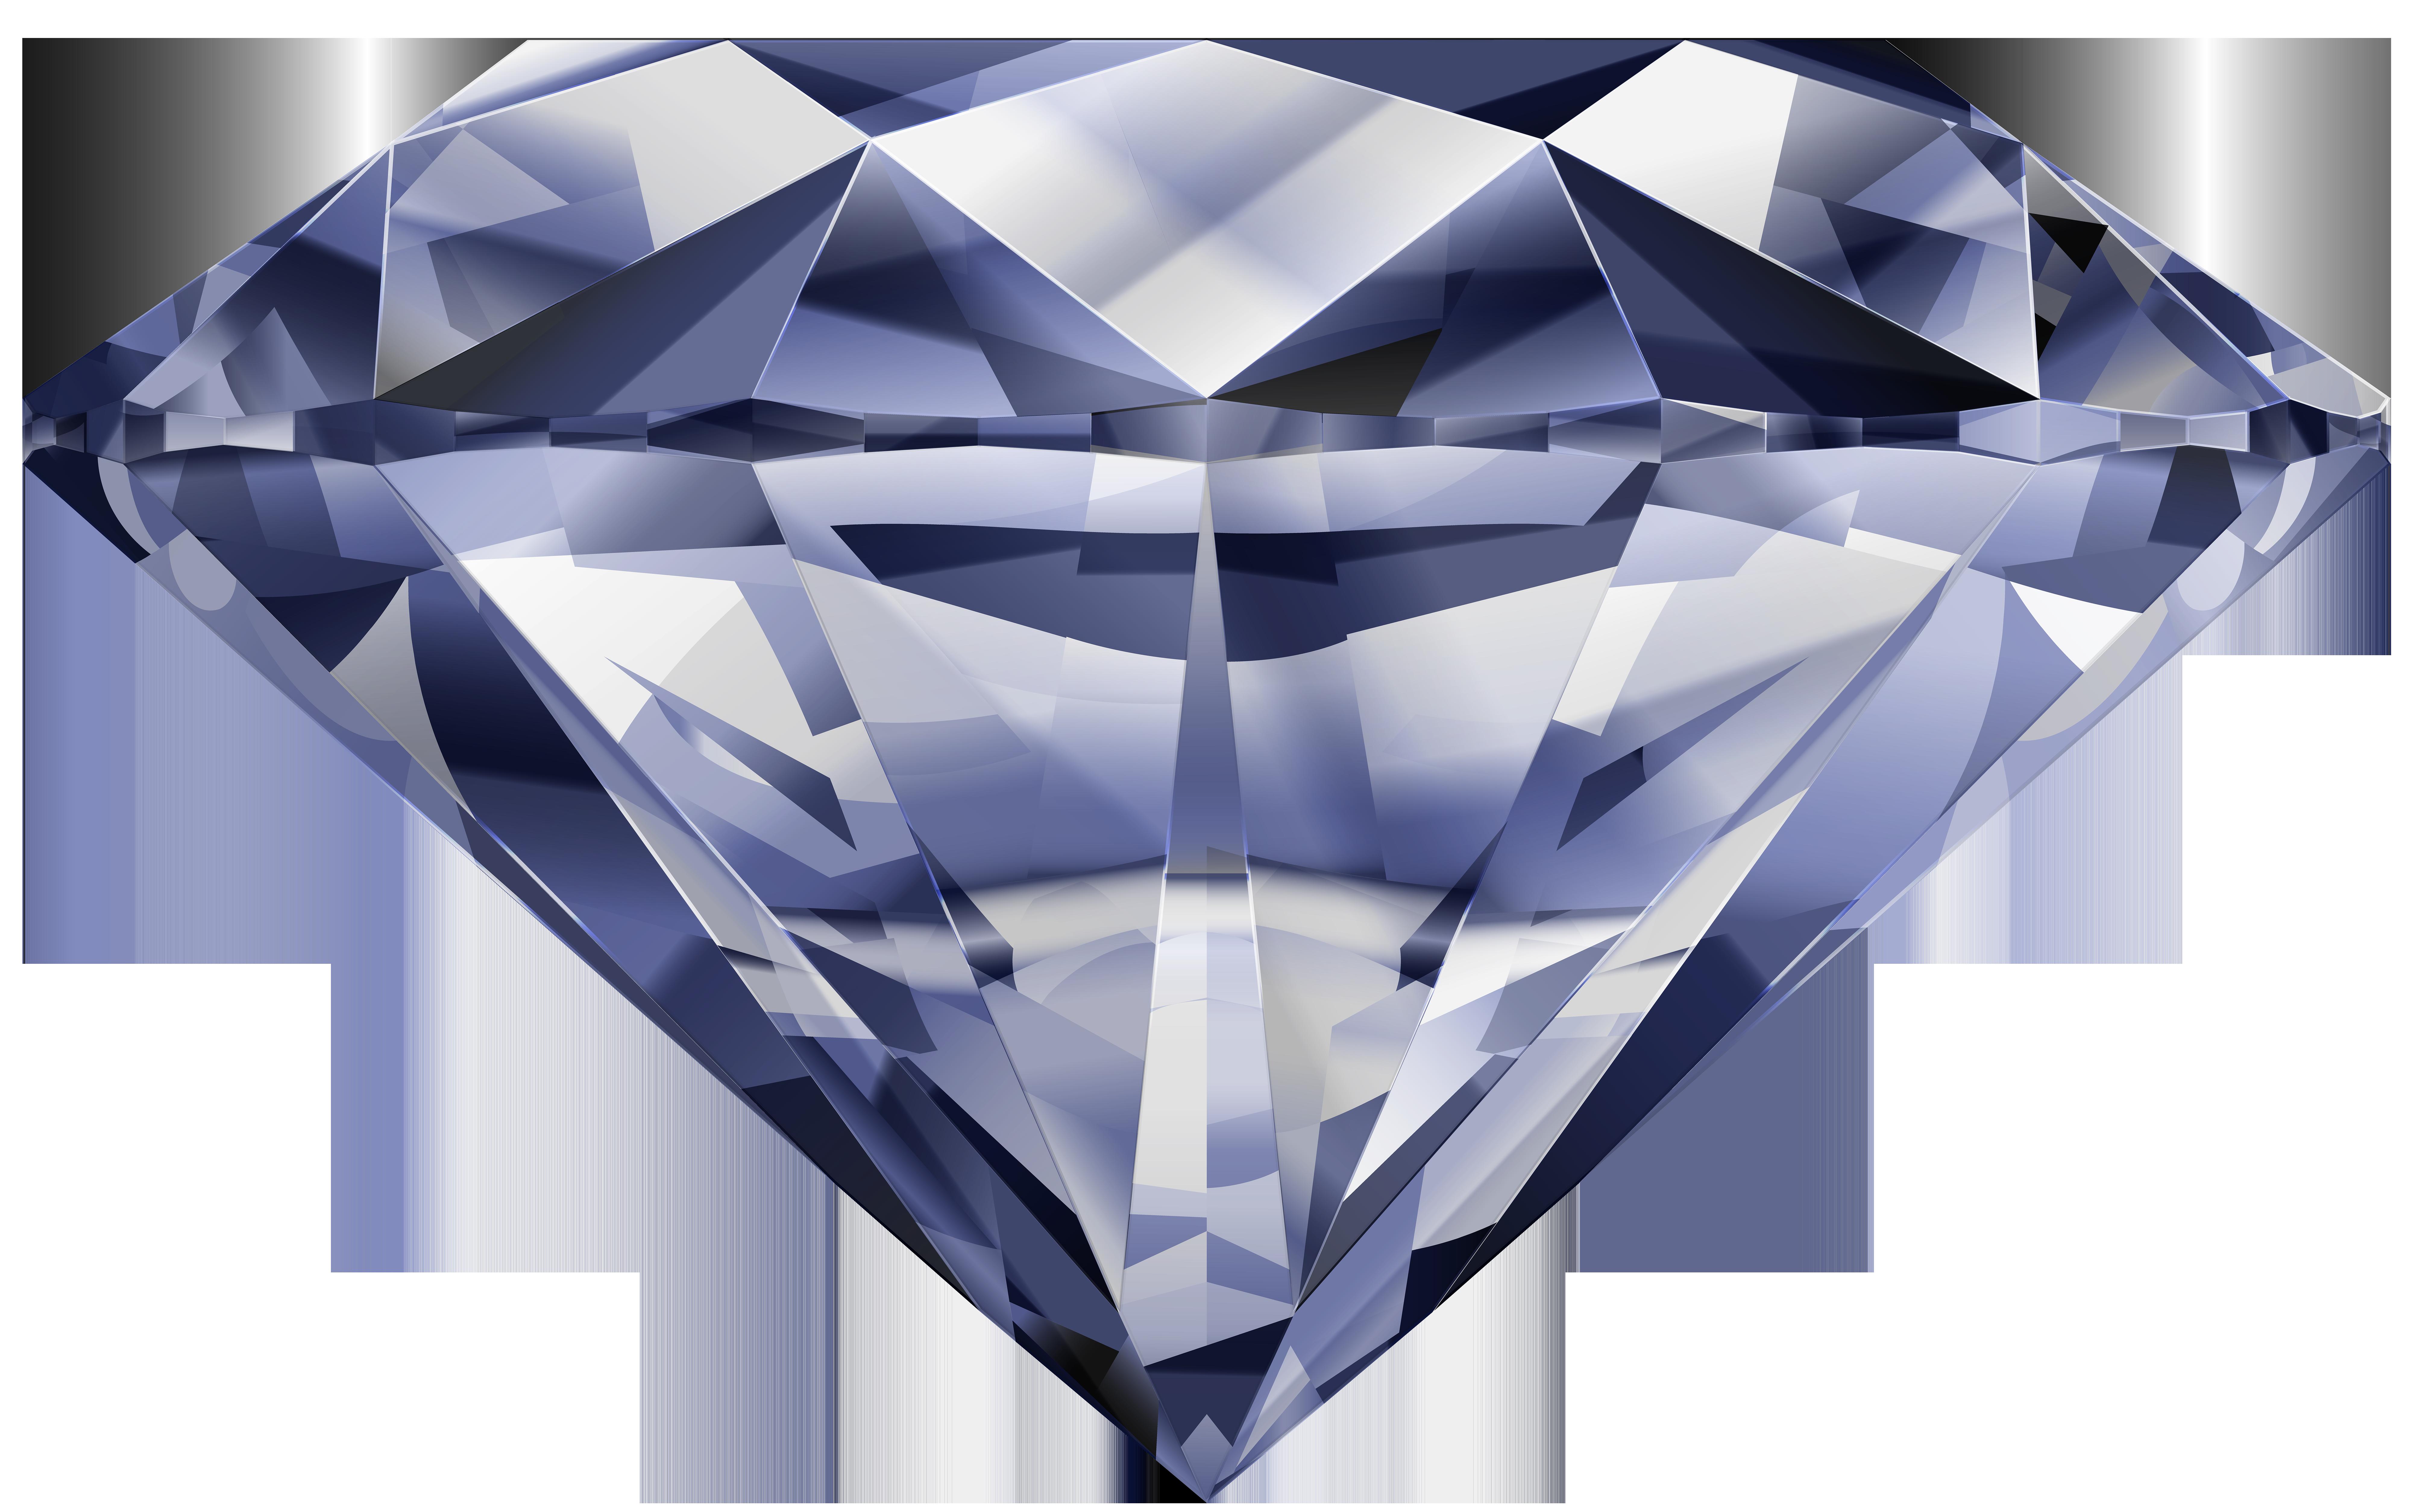 Diamonds clipart purple. Luckman fine arts complex